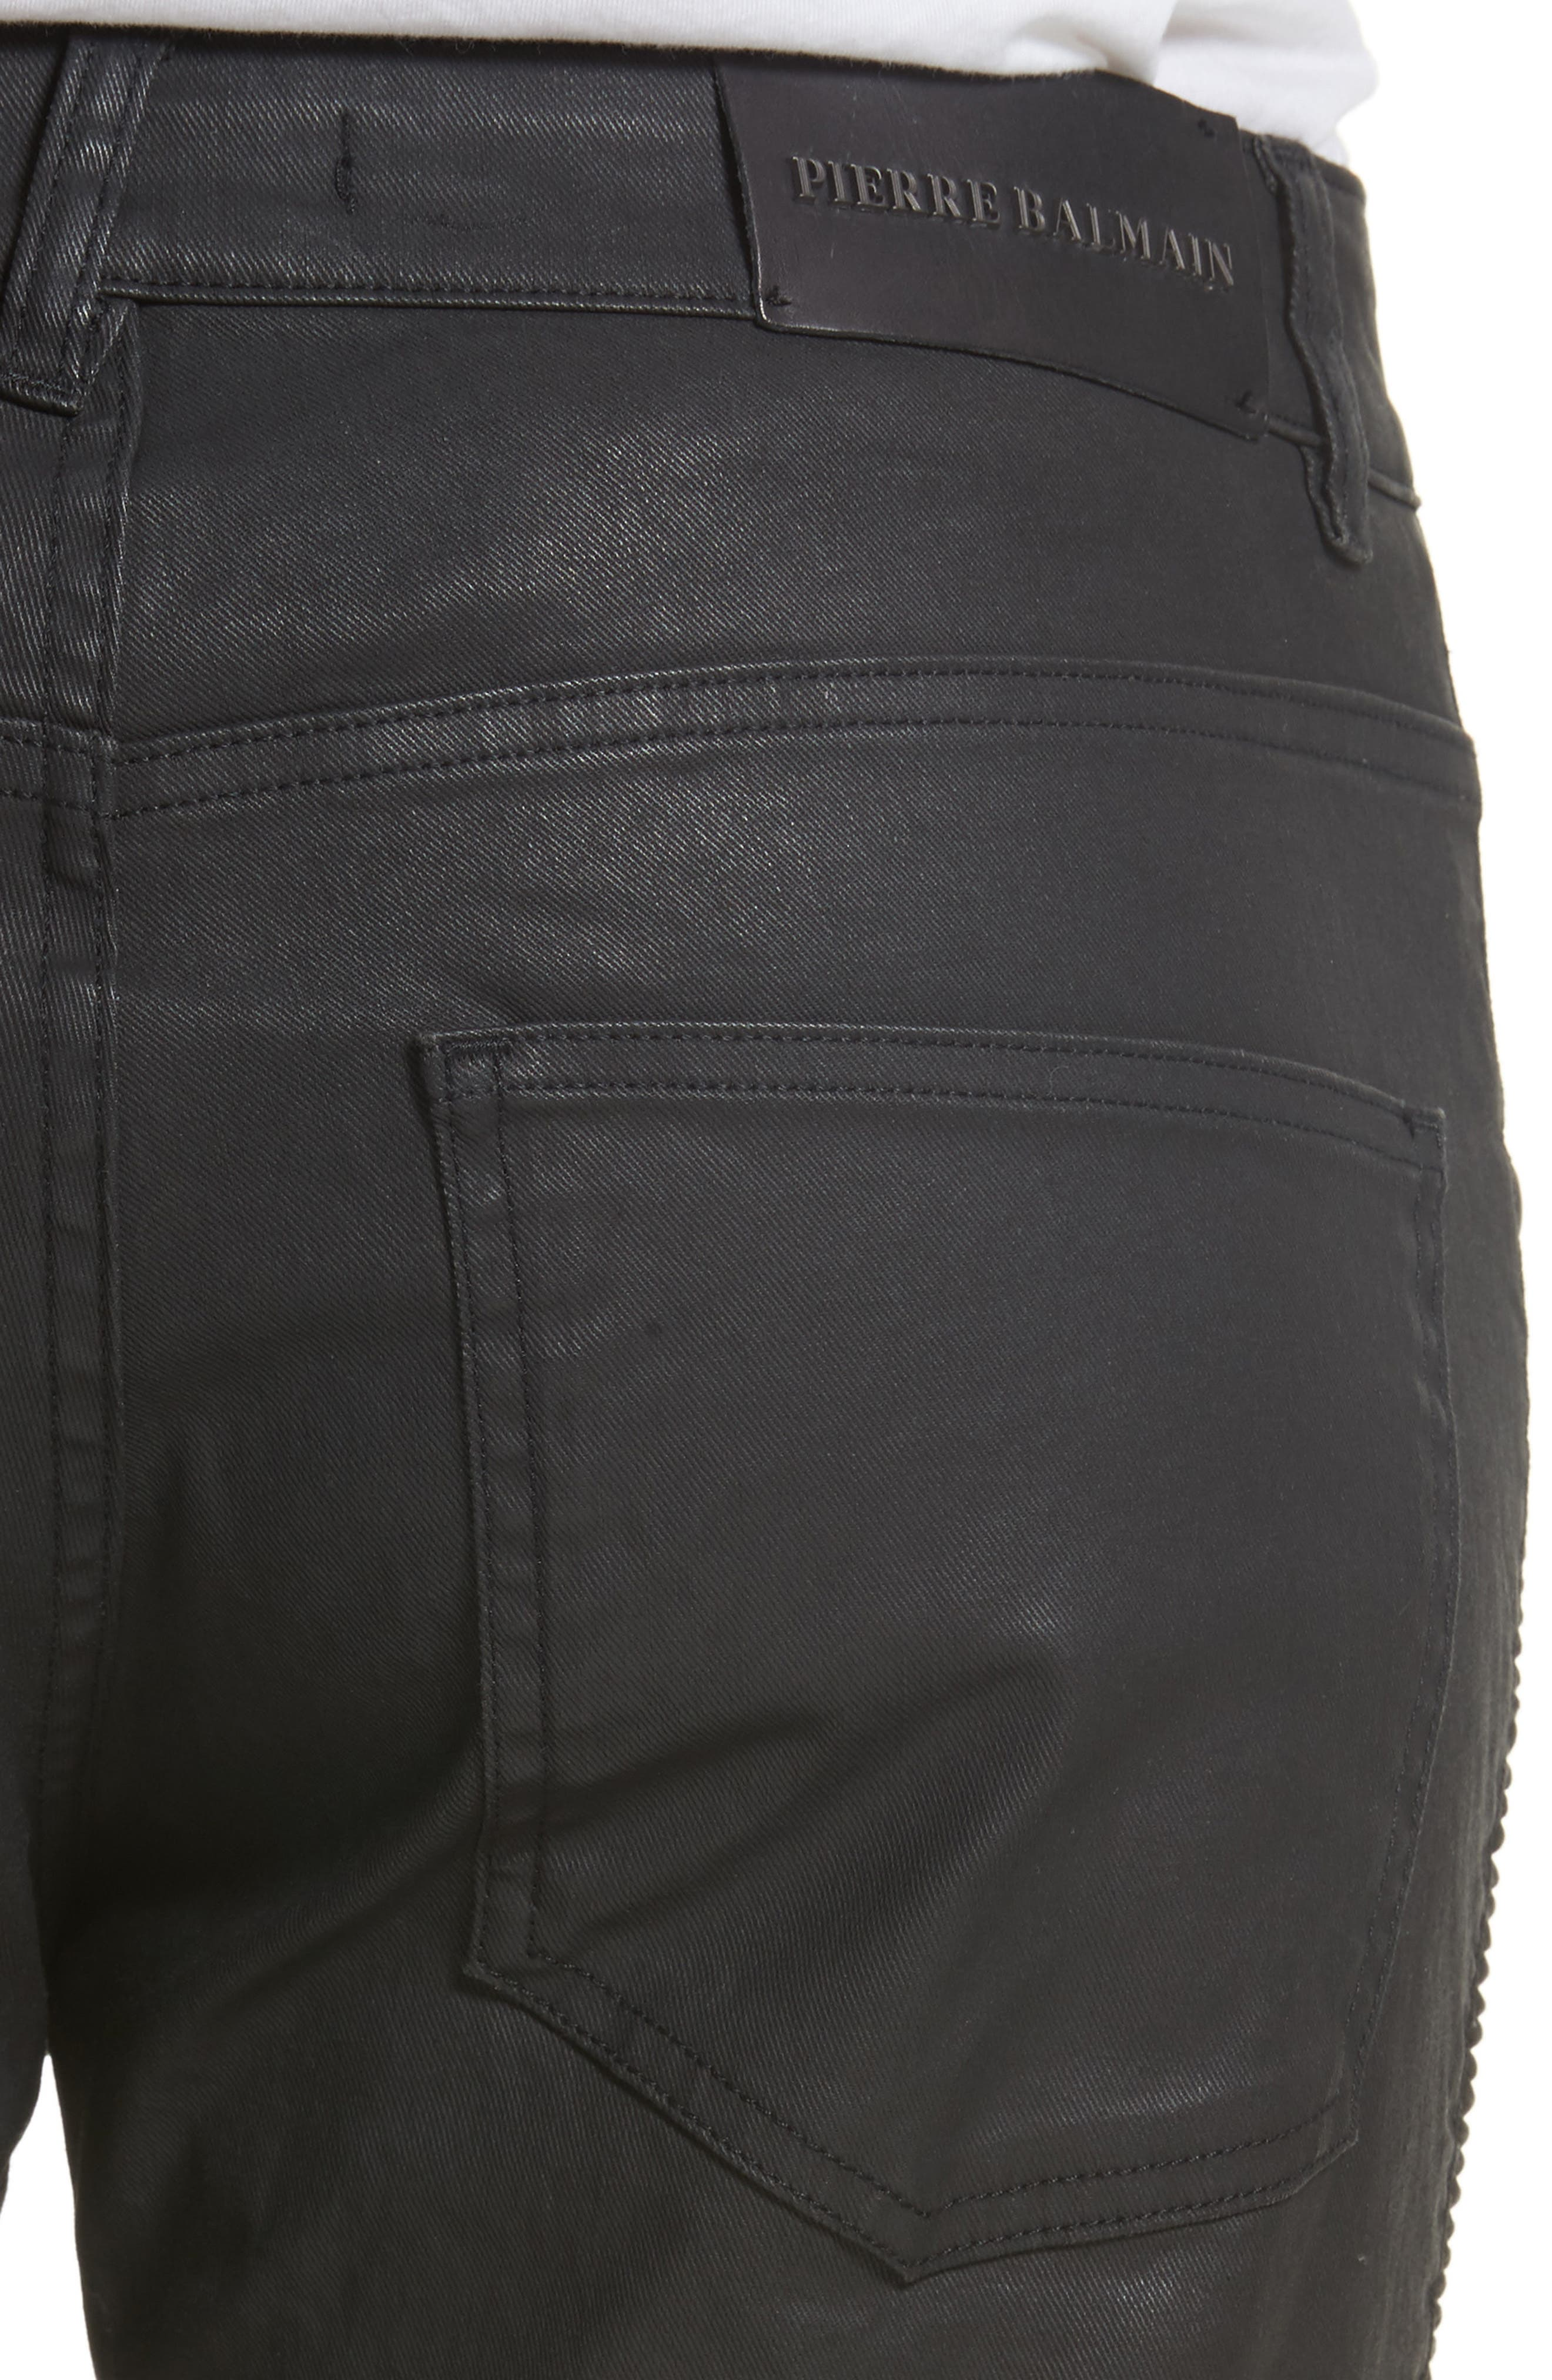 Alternate Image 5  - Pierre Balmain Core Coated Moto Jeans